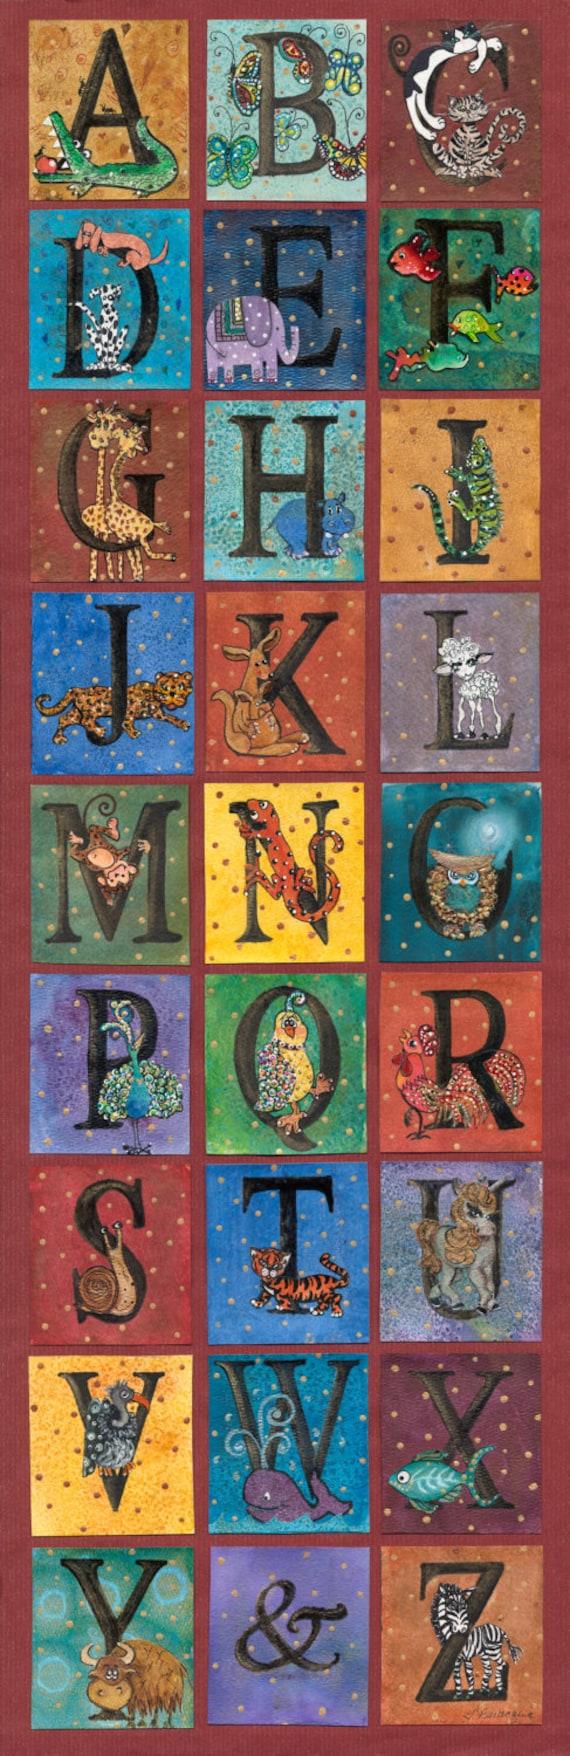 "12x36"" Giclee Print Whimsical Animal Alphabet - Gender Neutral ABC Artwork for the Nursery"